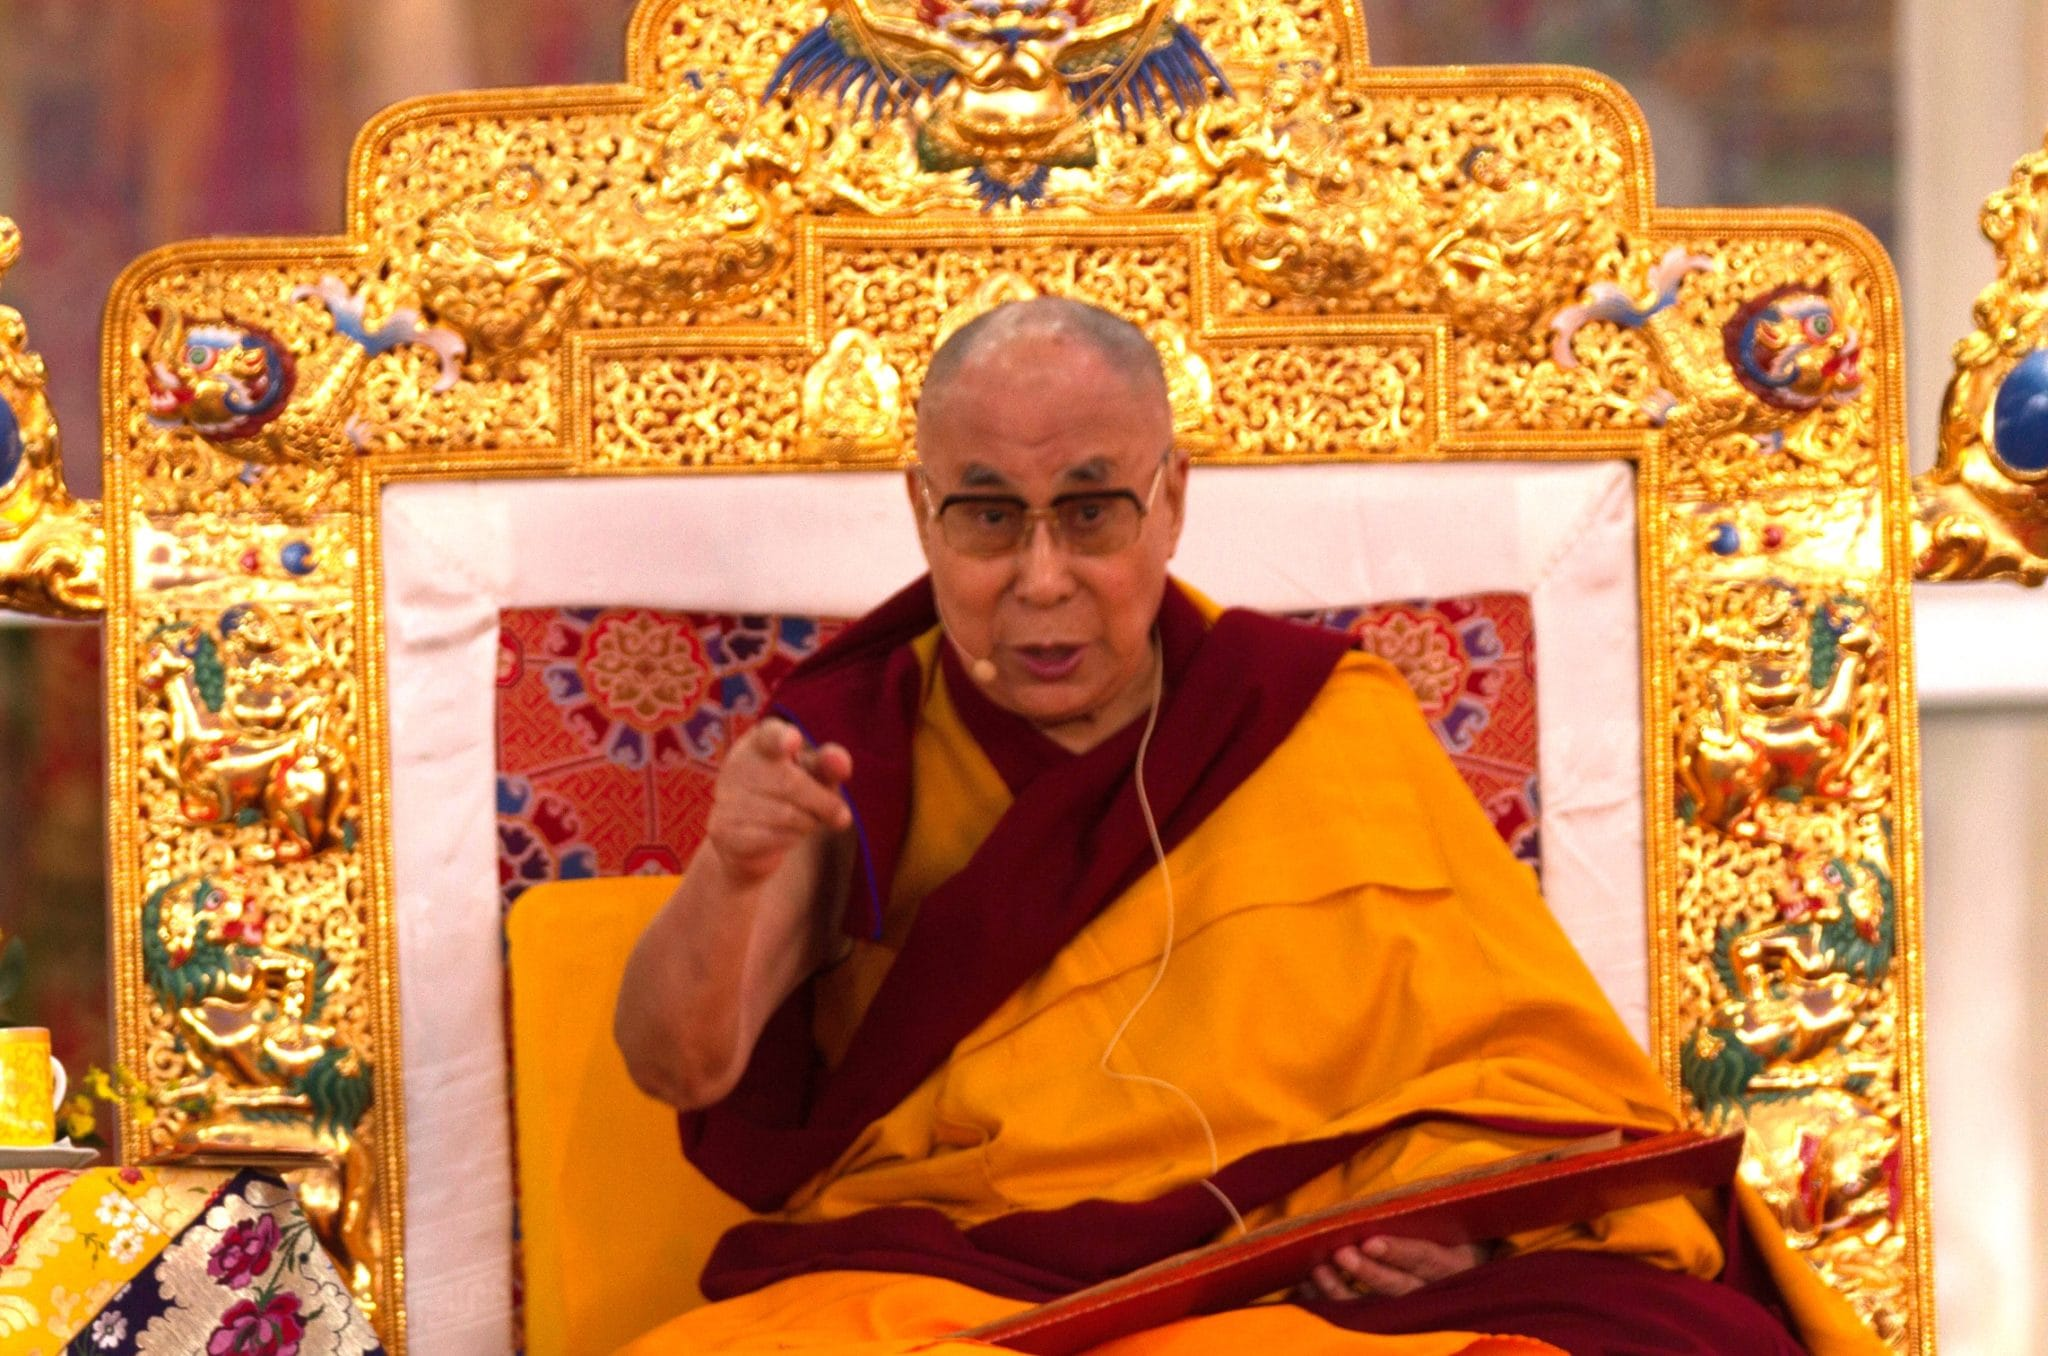 His Holiness the Dalai Lama at the Kalachakra Empowerment, Bodhgaya, India, 2017. Photo by Gordon Eaton.